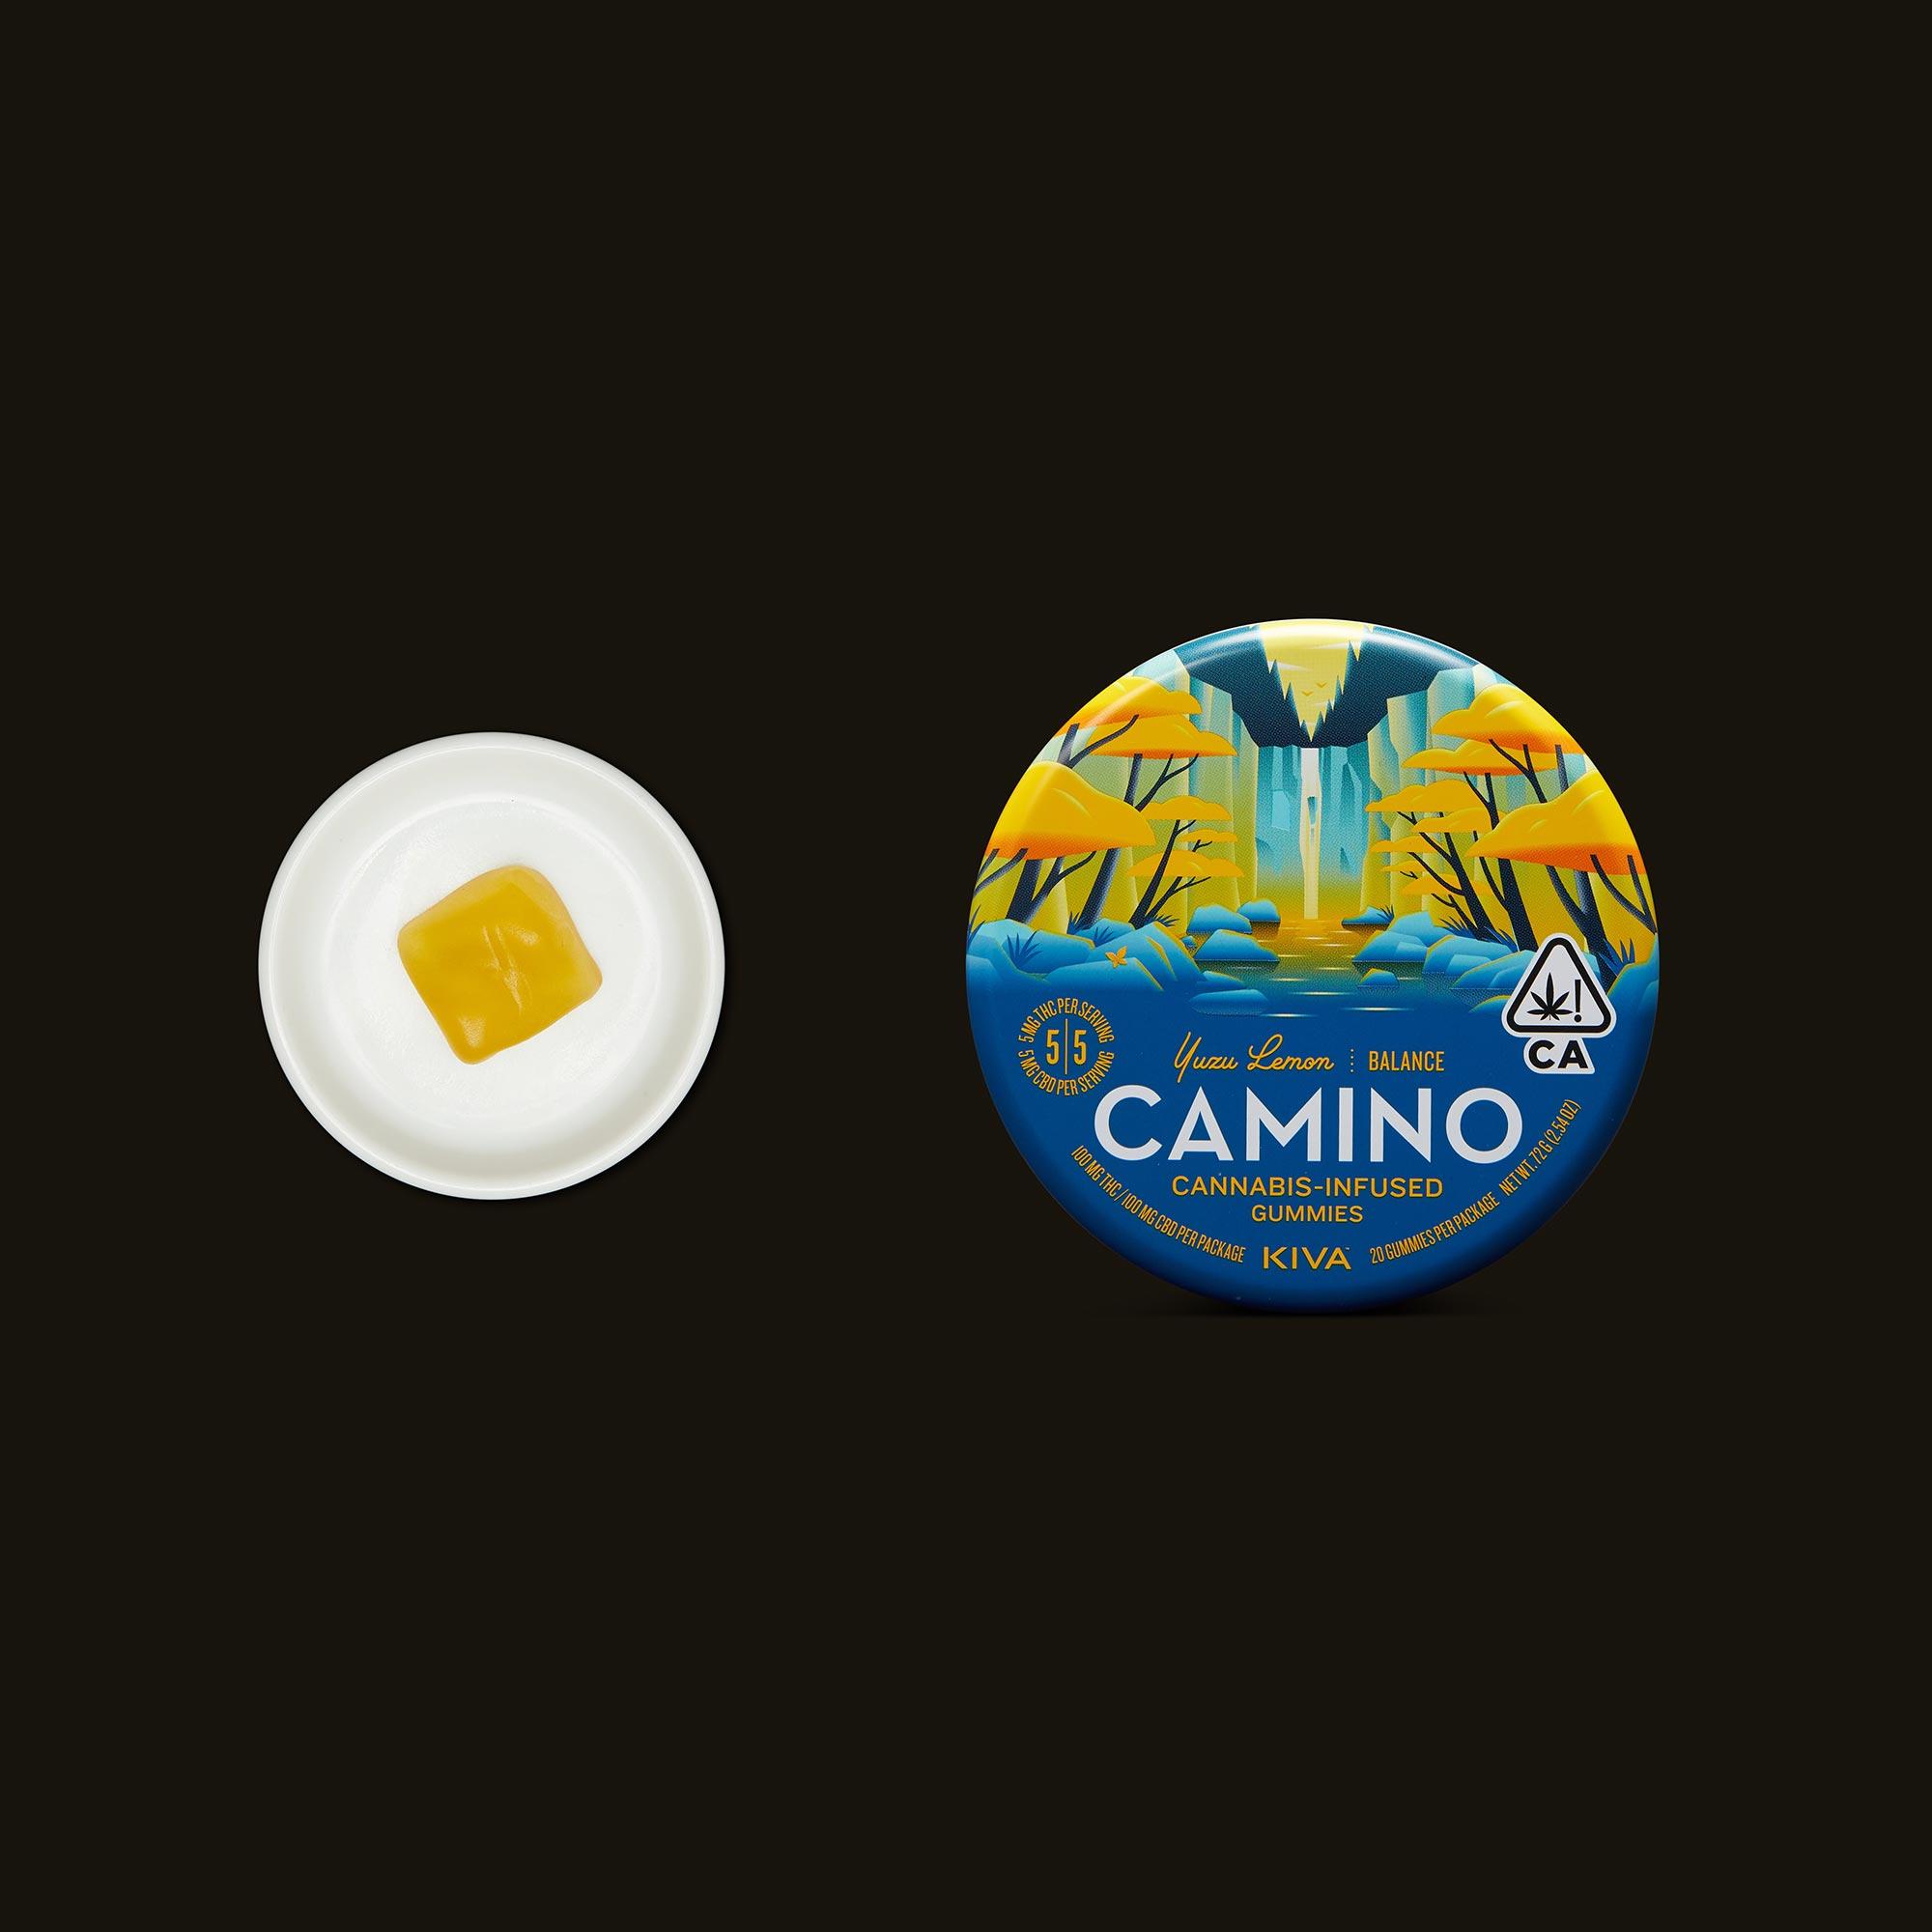 Kiva Confections Camino Yuzu Lemon Balance Gummies